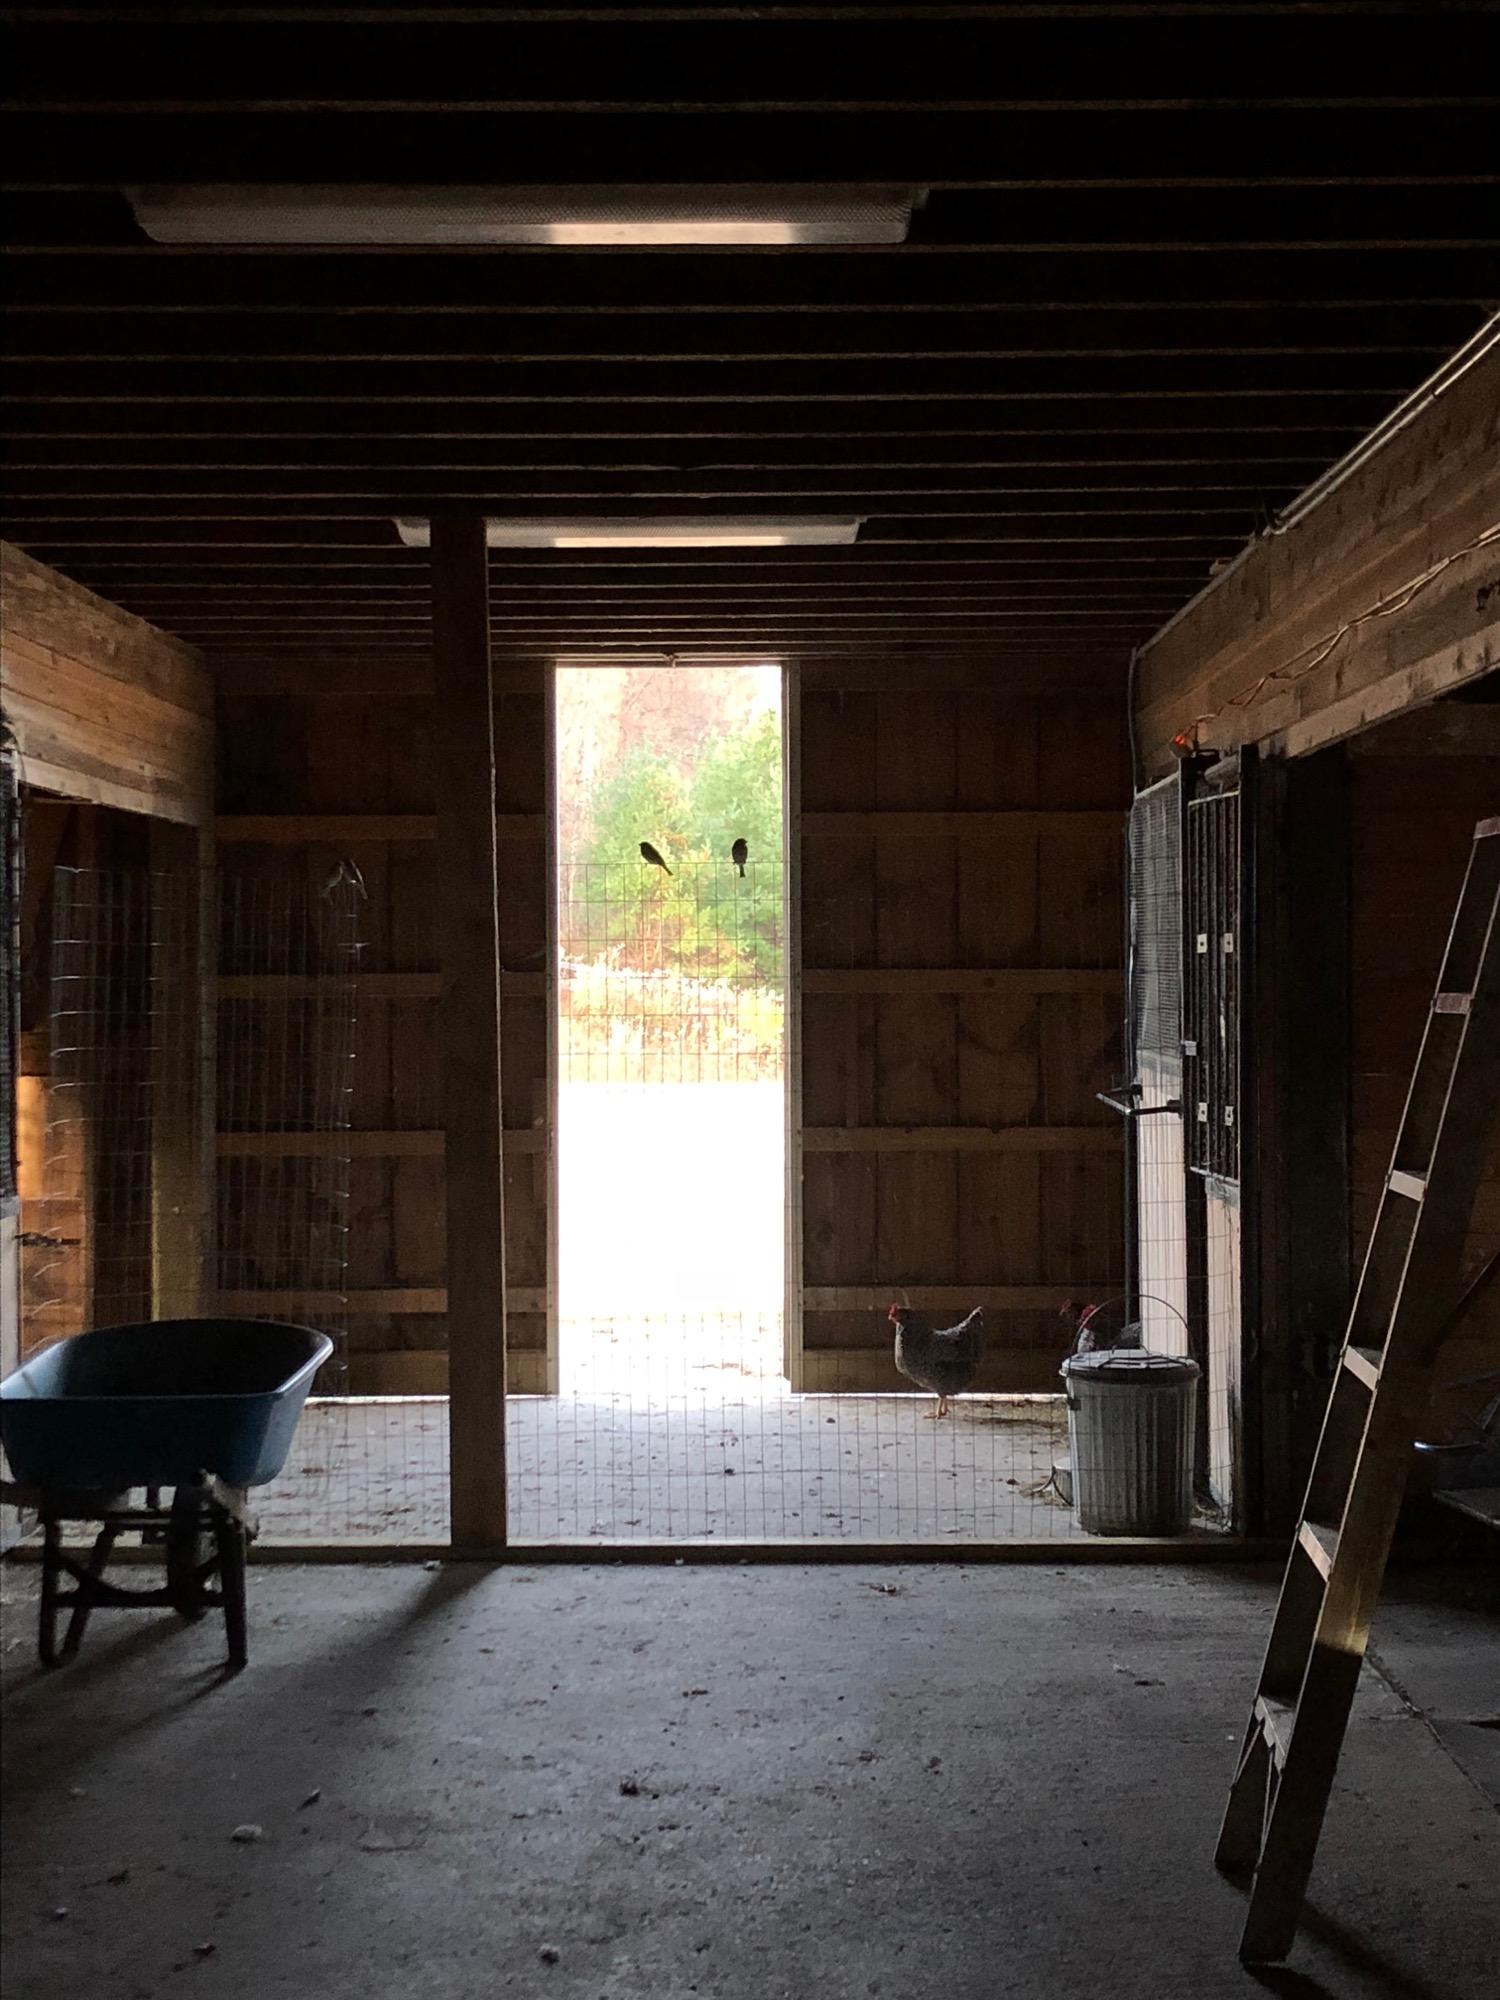 coop-area-barn-2birds.jpg